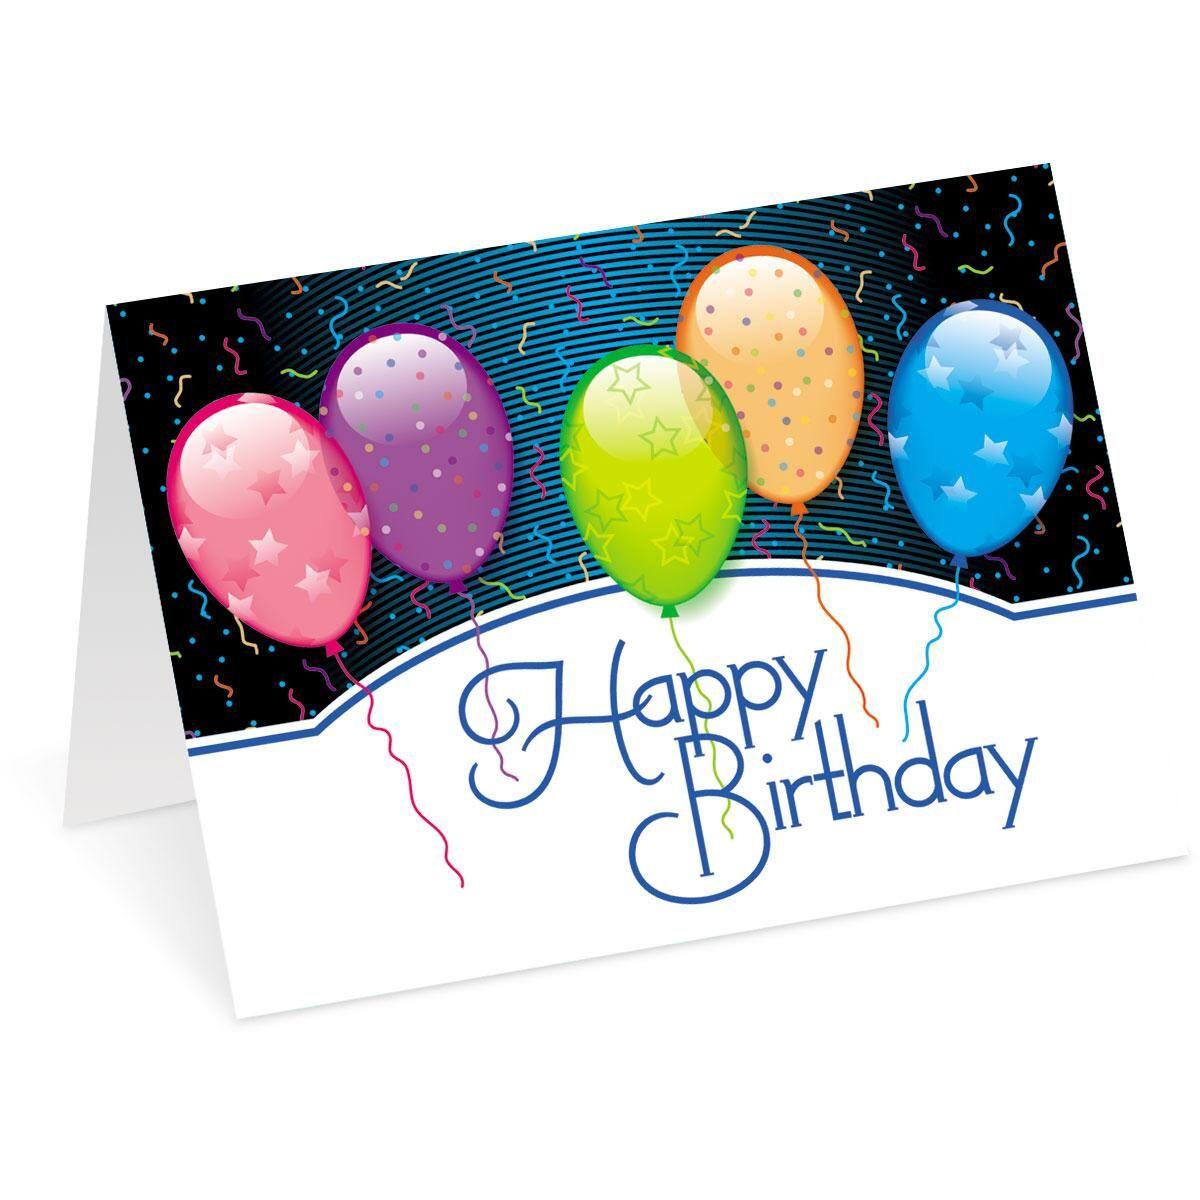 Birthday Balloons Birthday Cards & Seals